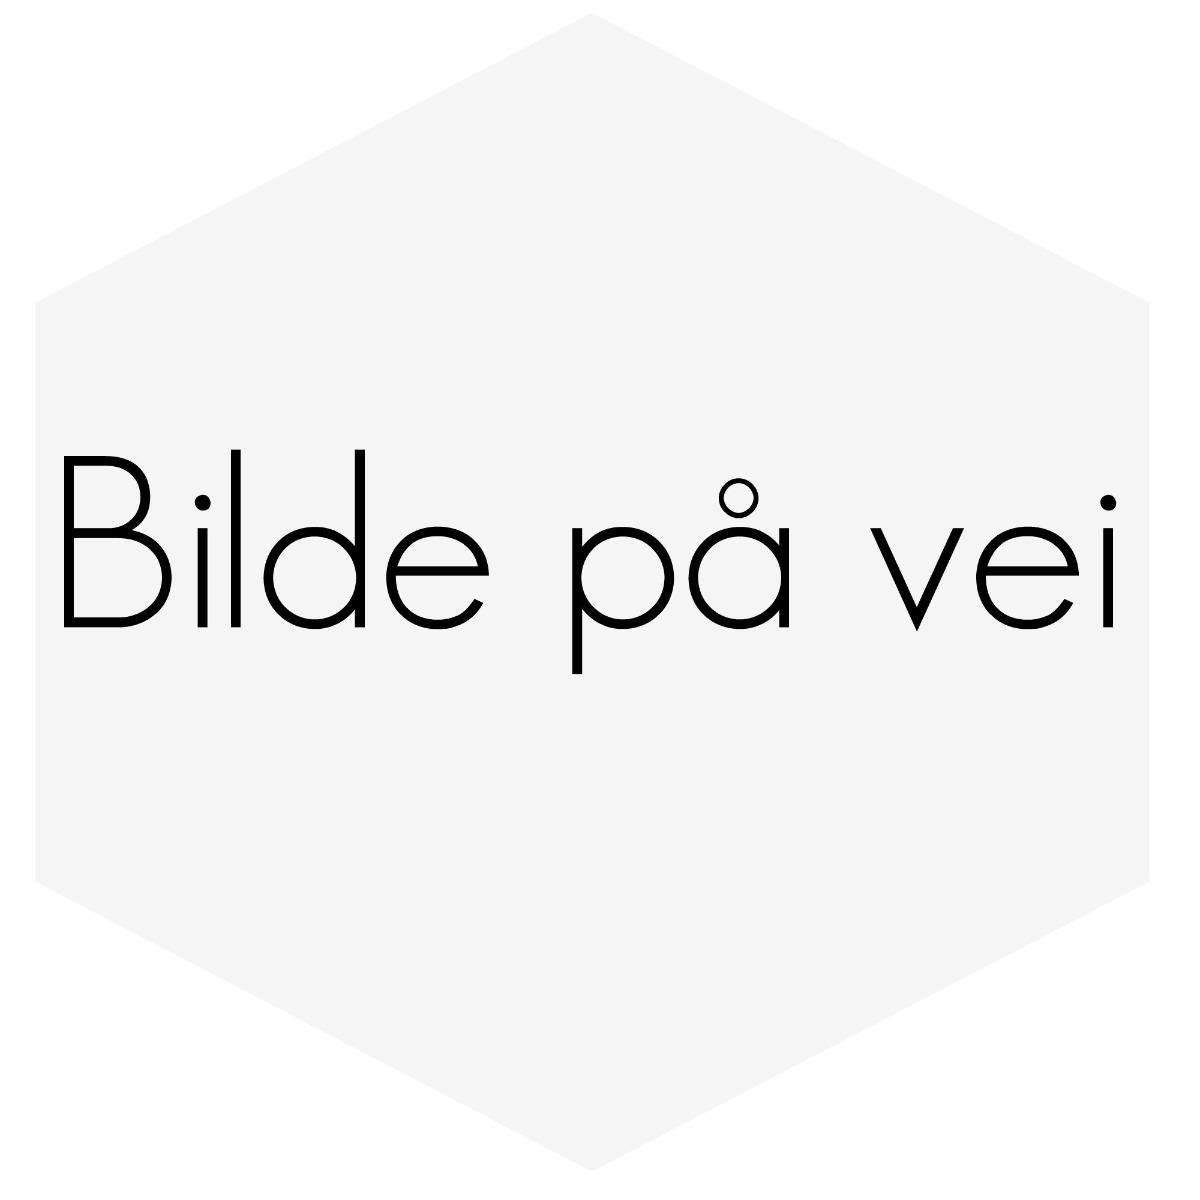 VENTILLØFTERE TIL VOLVO B18/B20/B30 1218630 PRIS PR STK